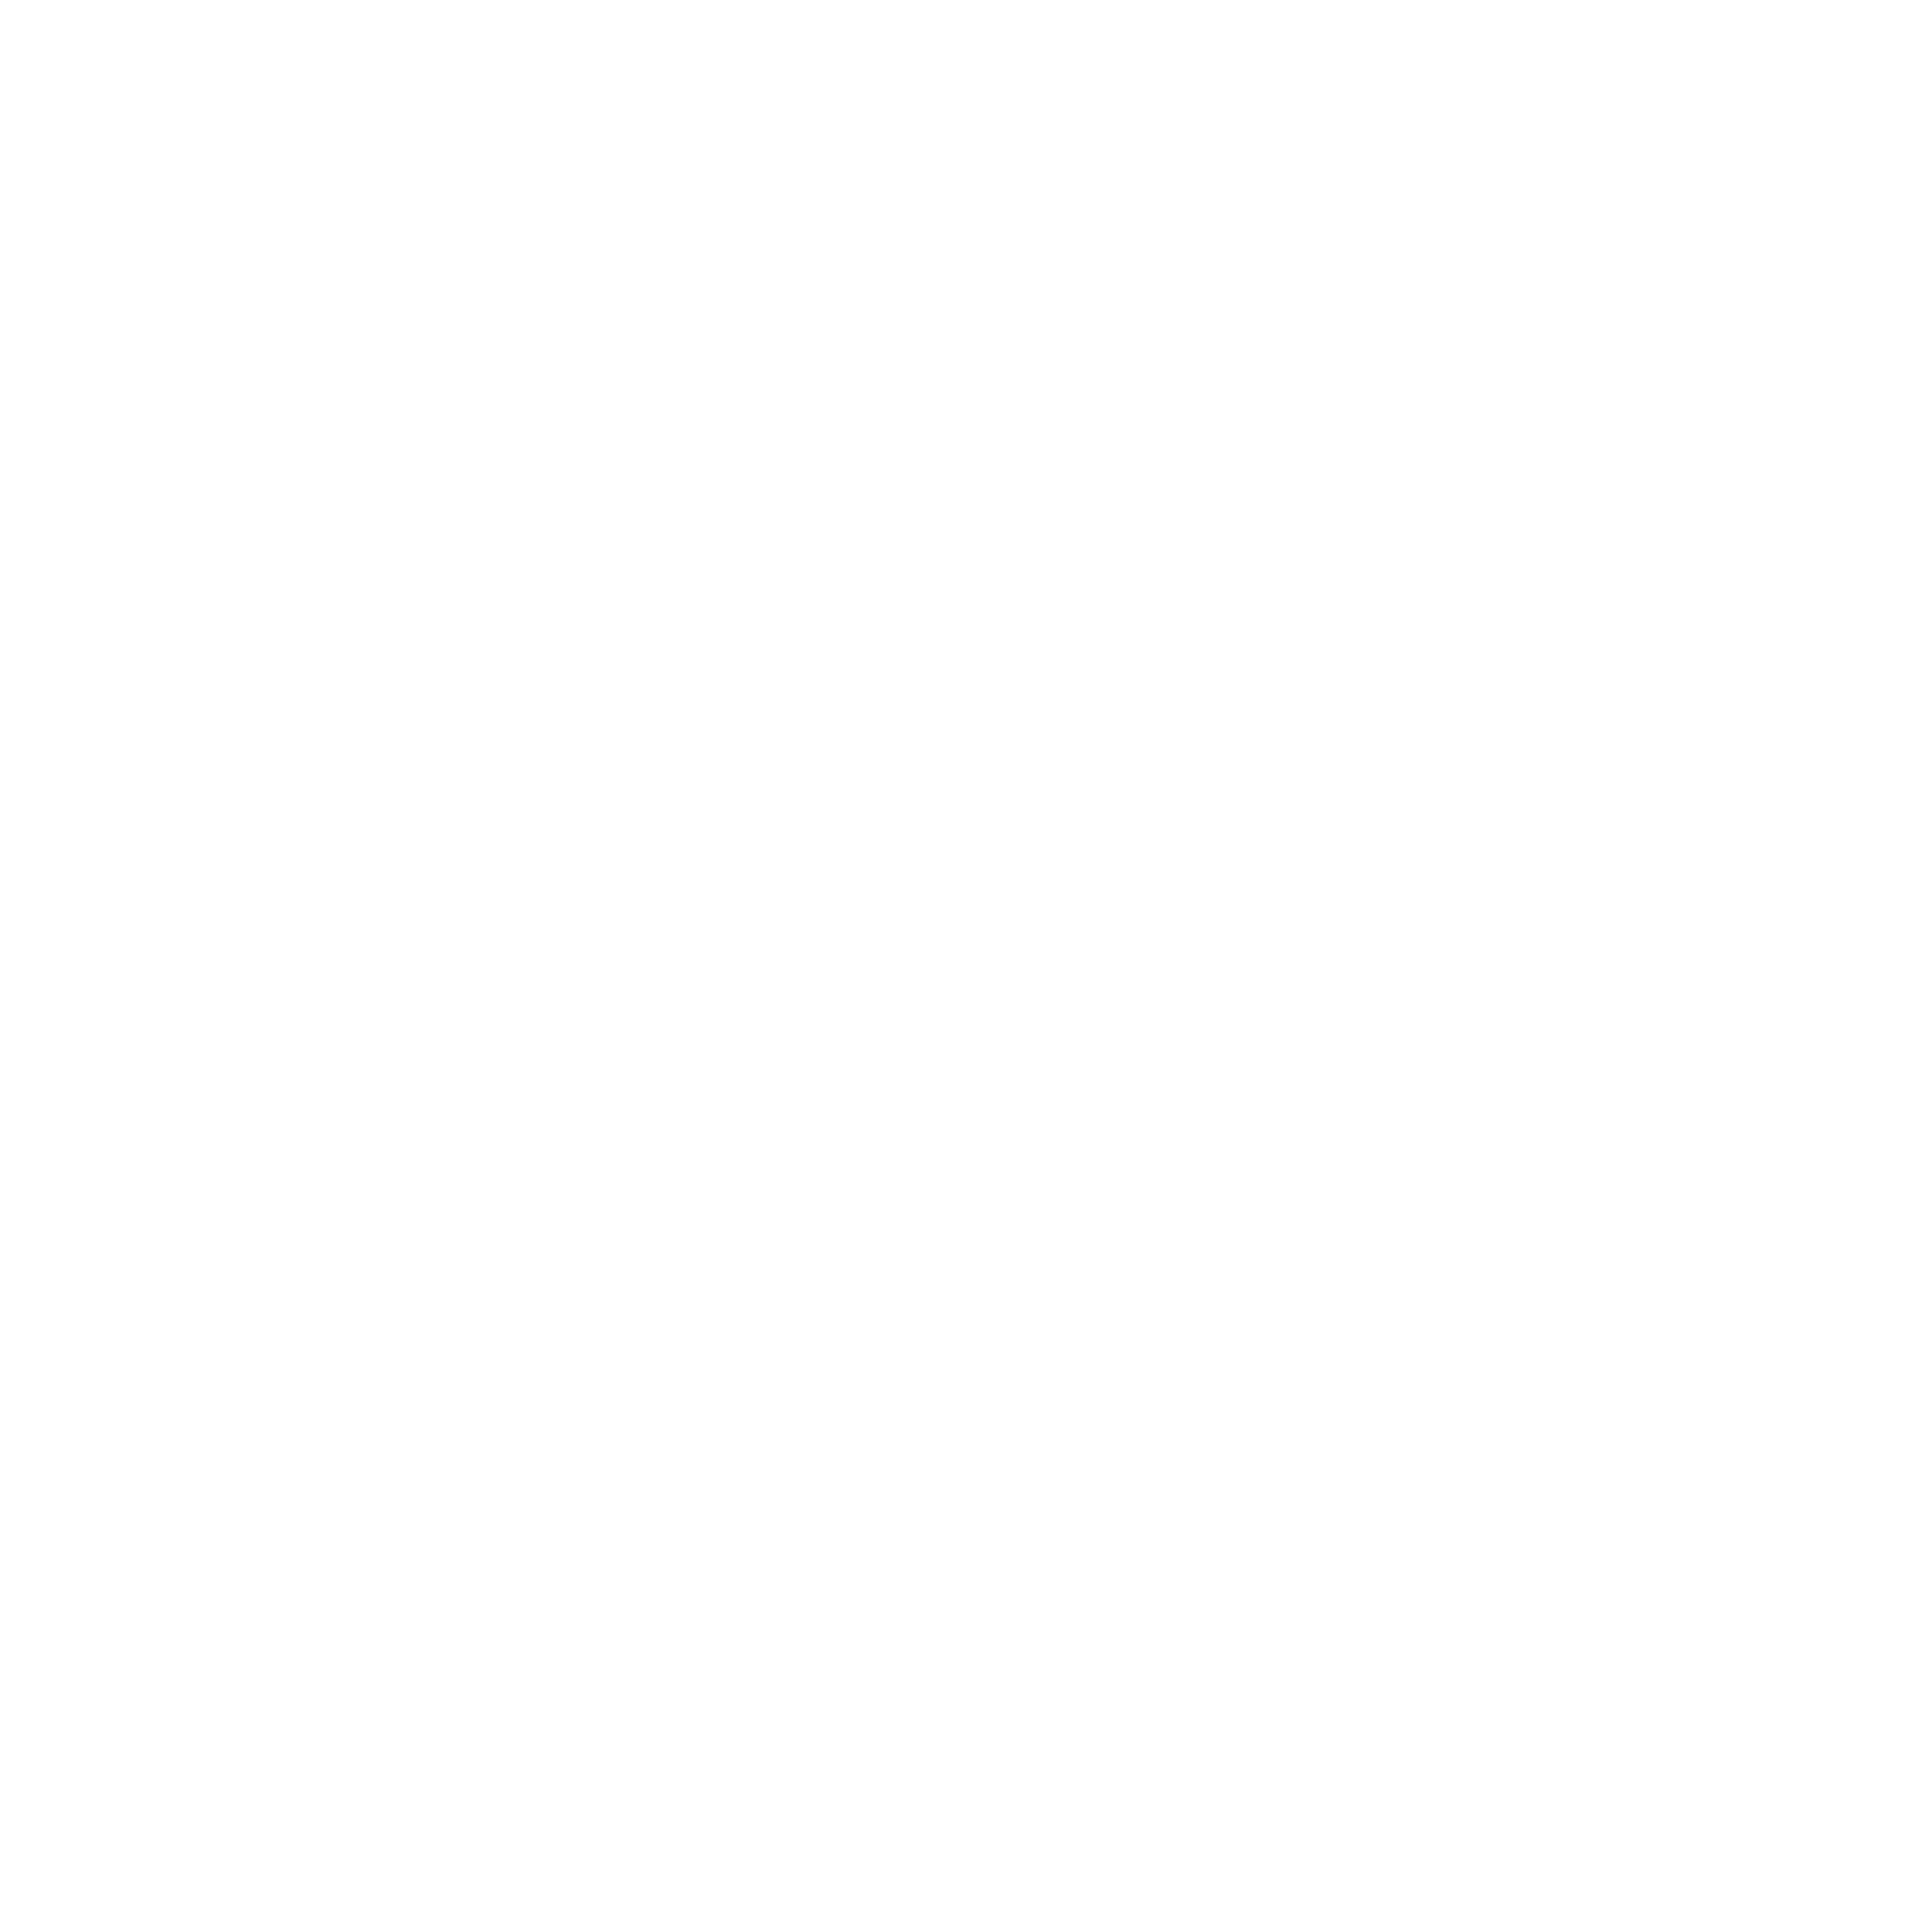 Logo Cooperativa Arcobaleno